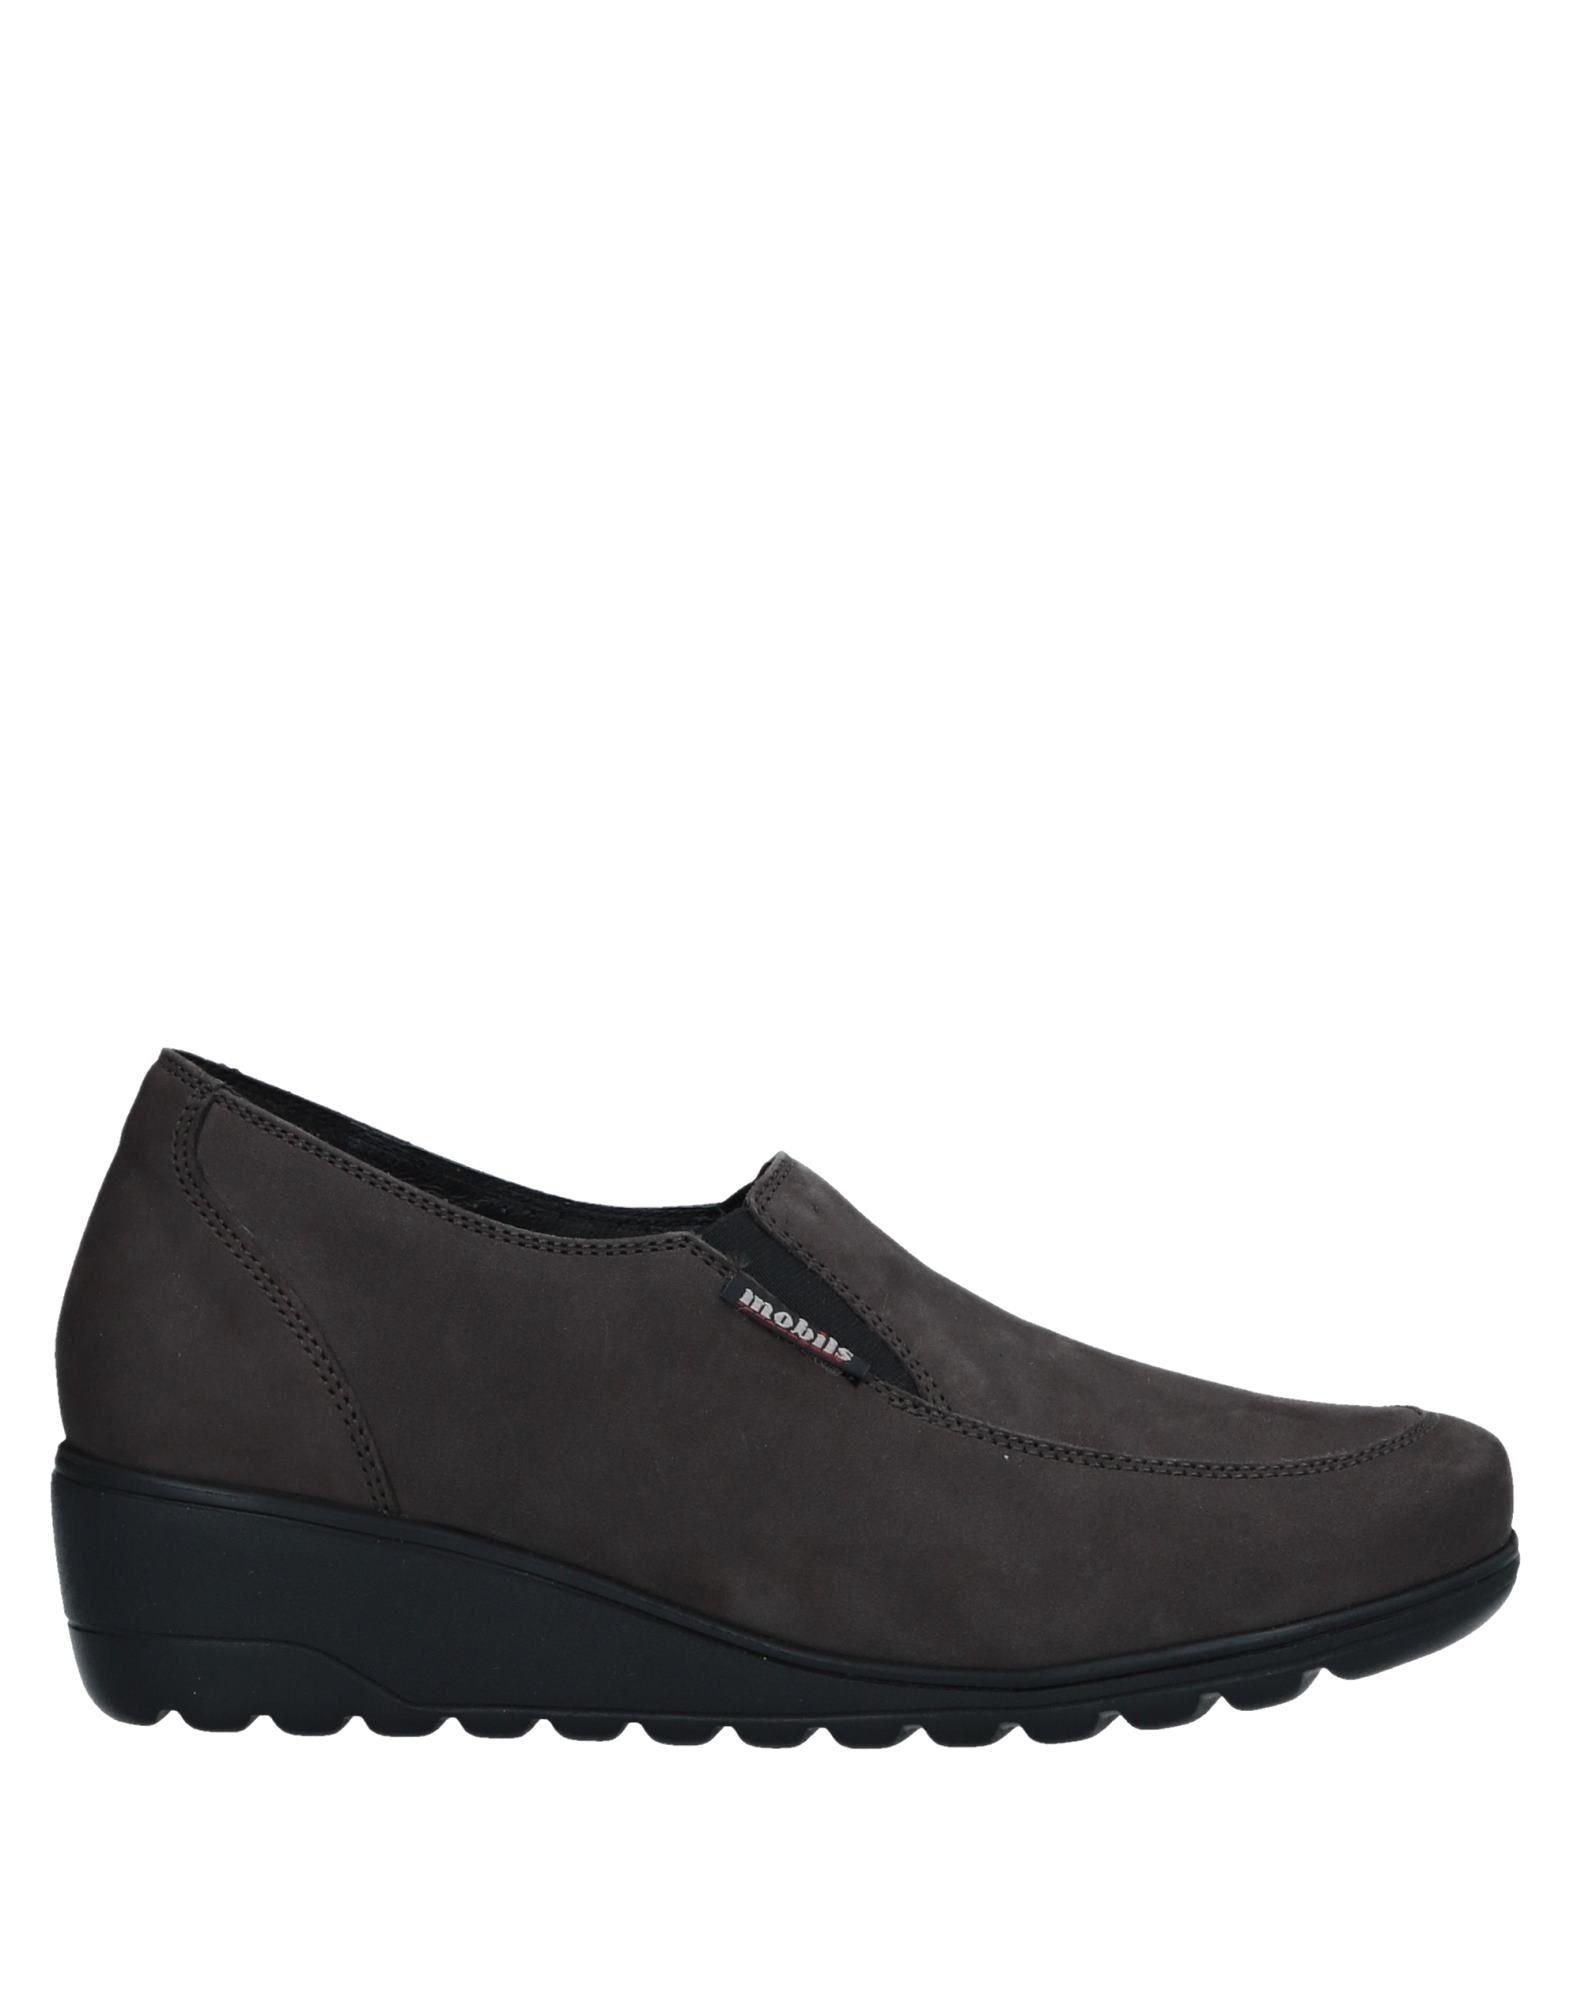 Mephisto Loafers - Women  Mephisto Loafers online on  Women United Kingdom - 11529294JJ 25218b